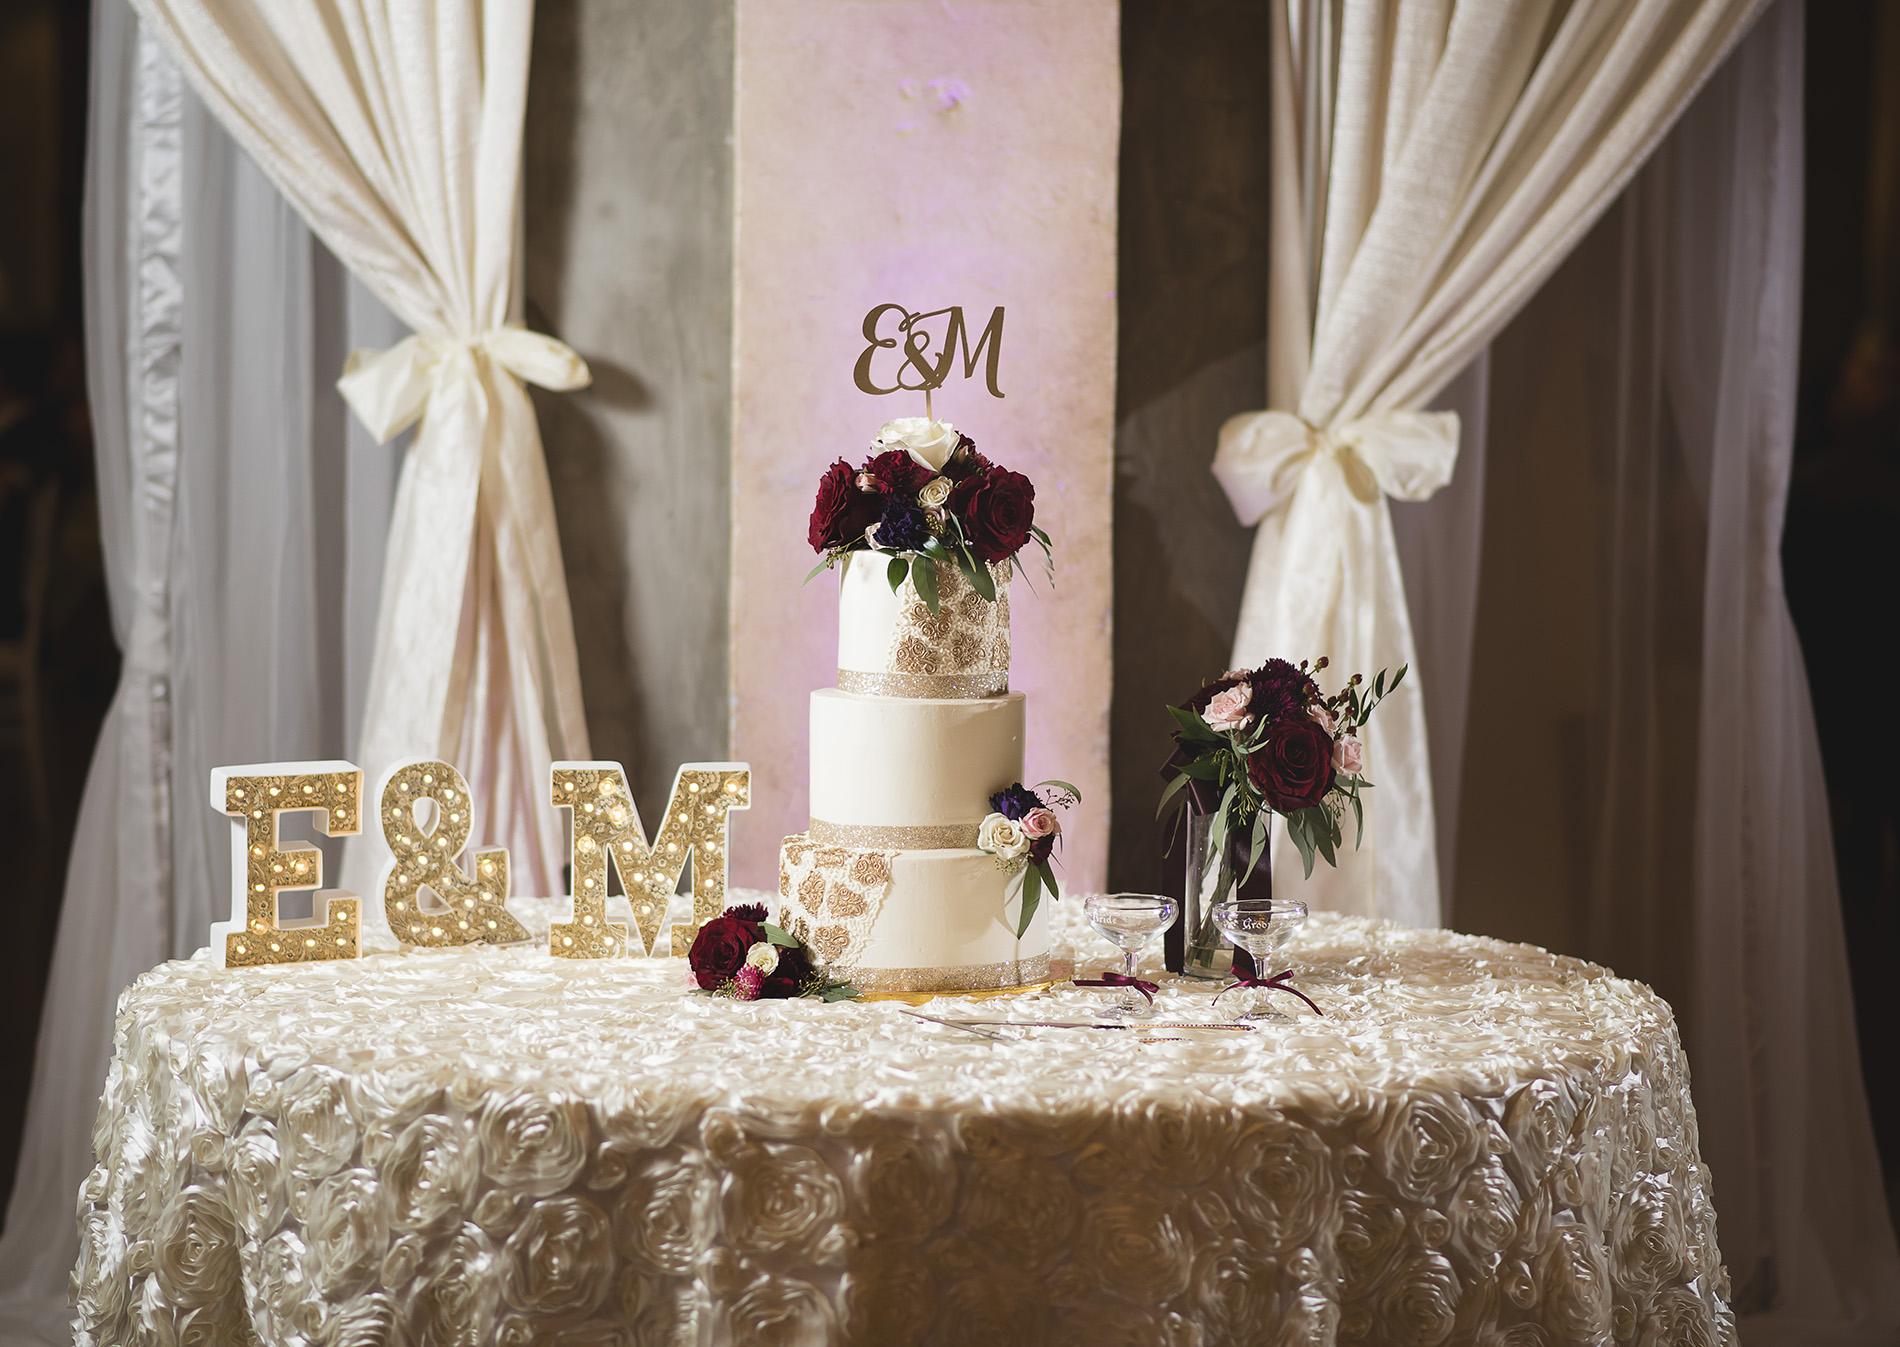 Houston-venue-Olde-Dobbin-Station-Romantic-Classic-Wedding-Photographer-102.jpg